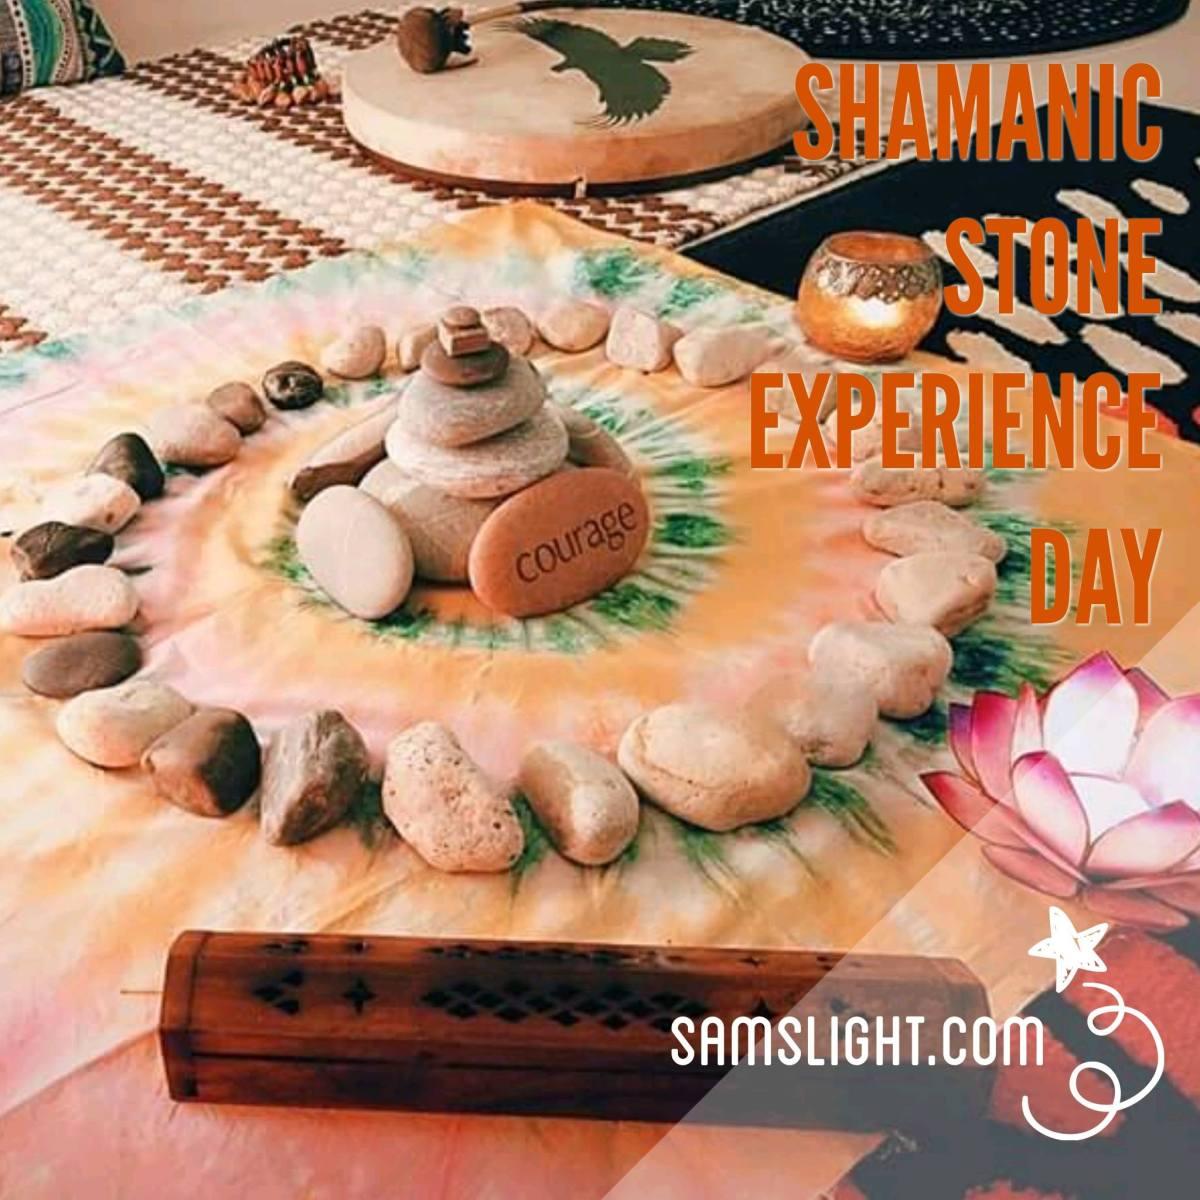 Shamanic 薩滿石頭占卜~ 2018生命藍圖閱讀 及 石頭治療體驗日